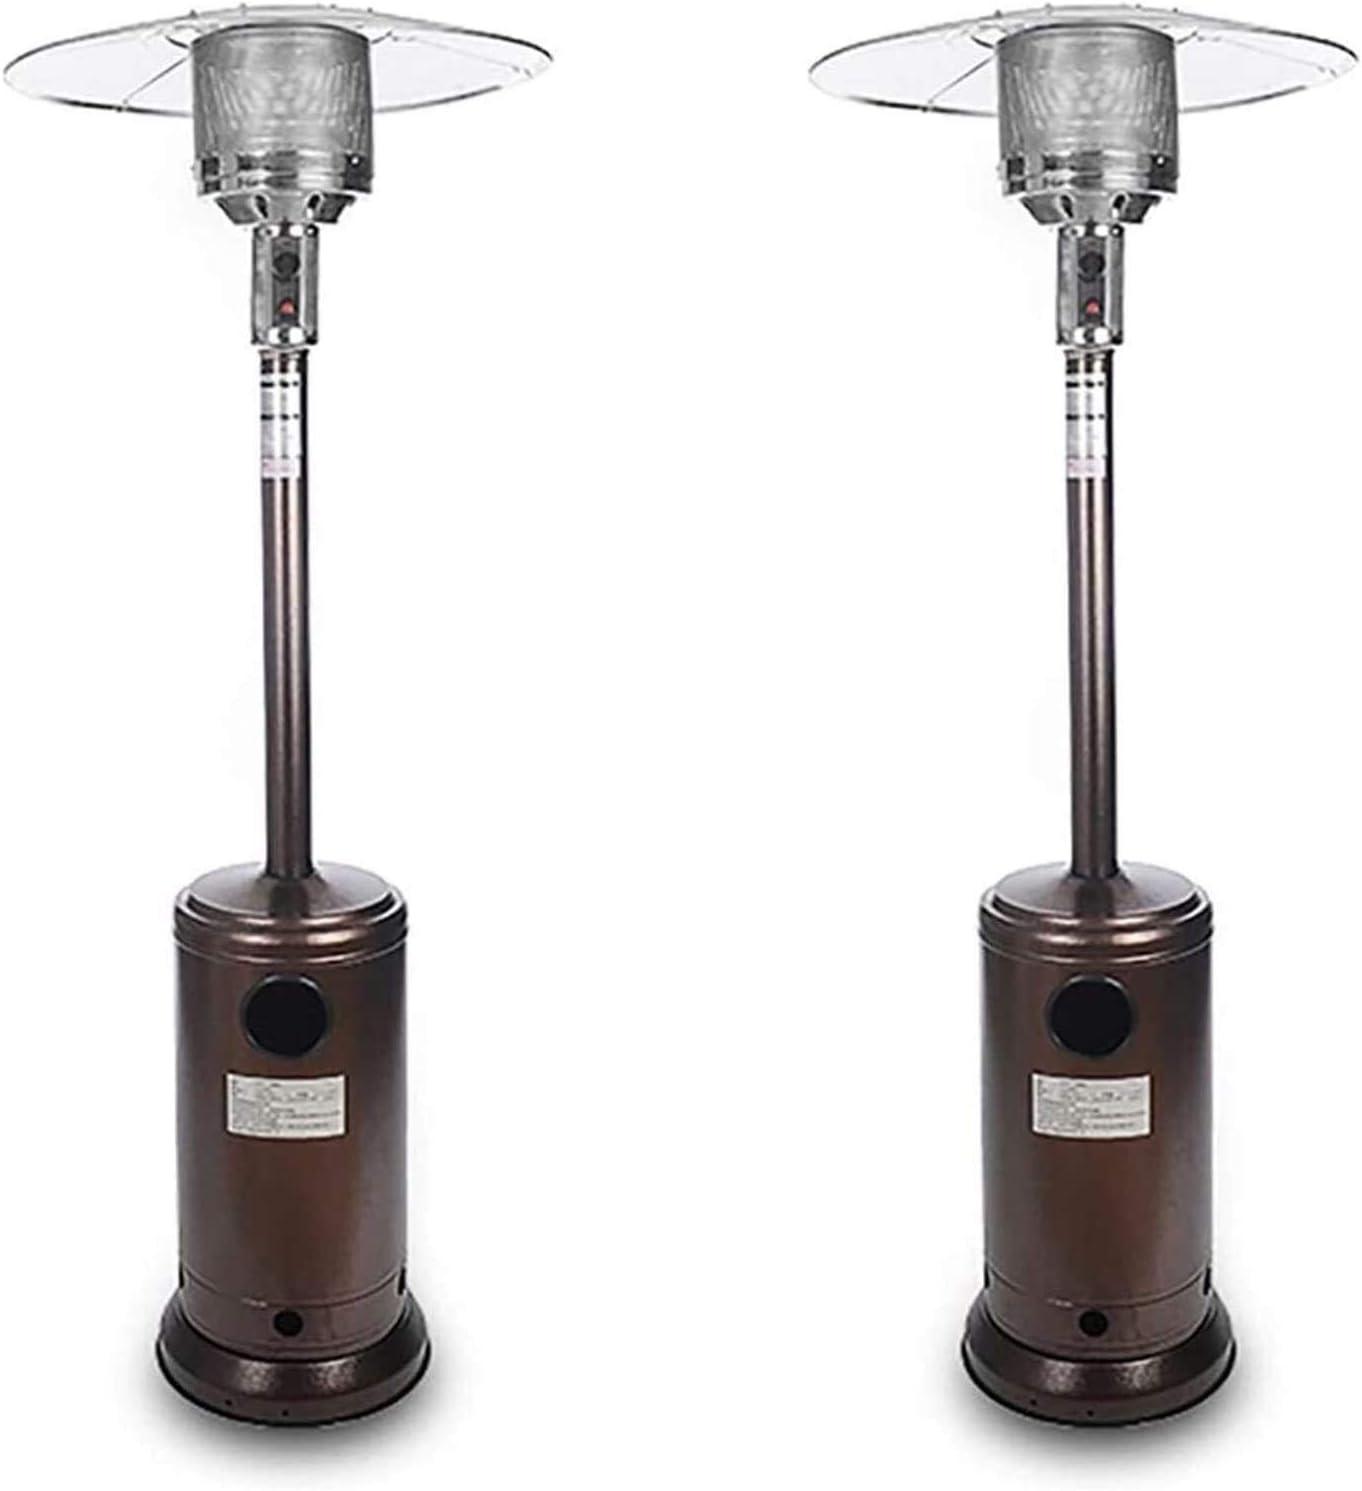 ZAQXSW Outdoor Cheap bargain Heaters for Heater Propane He Patio New York Mall